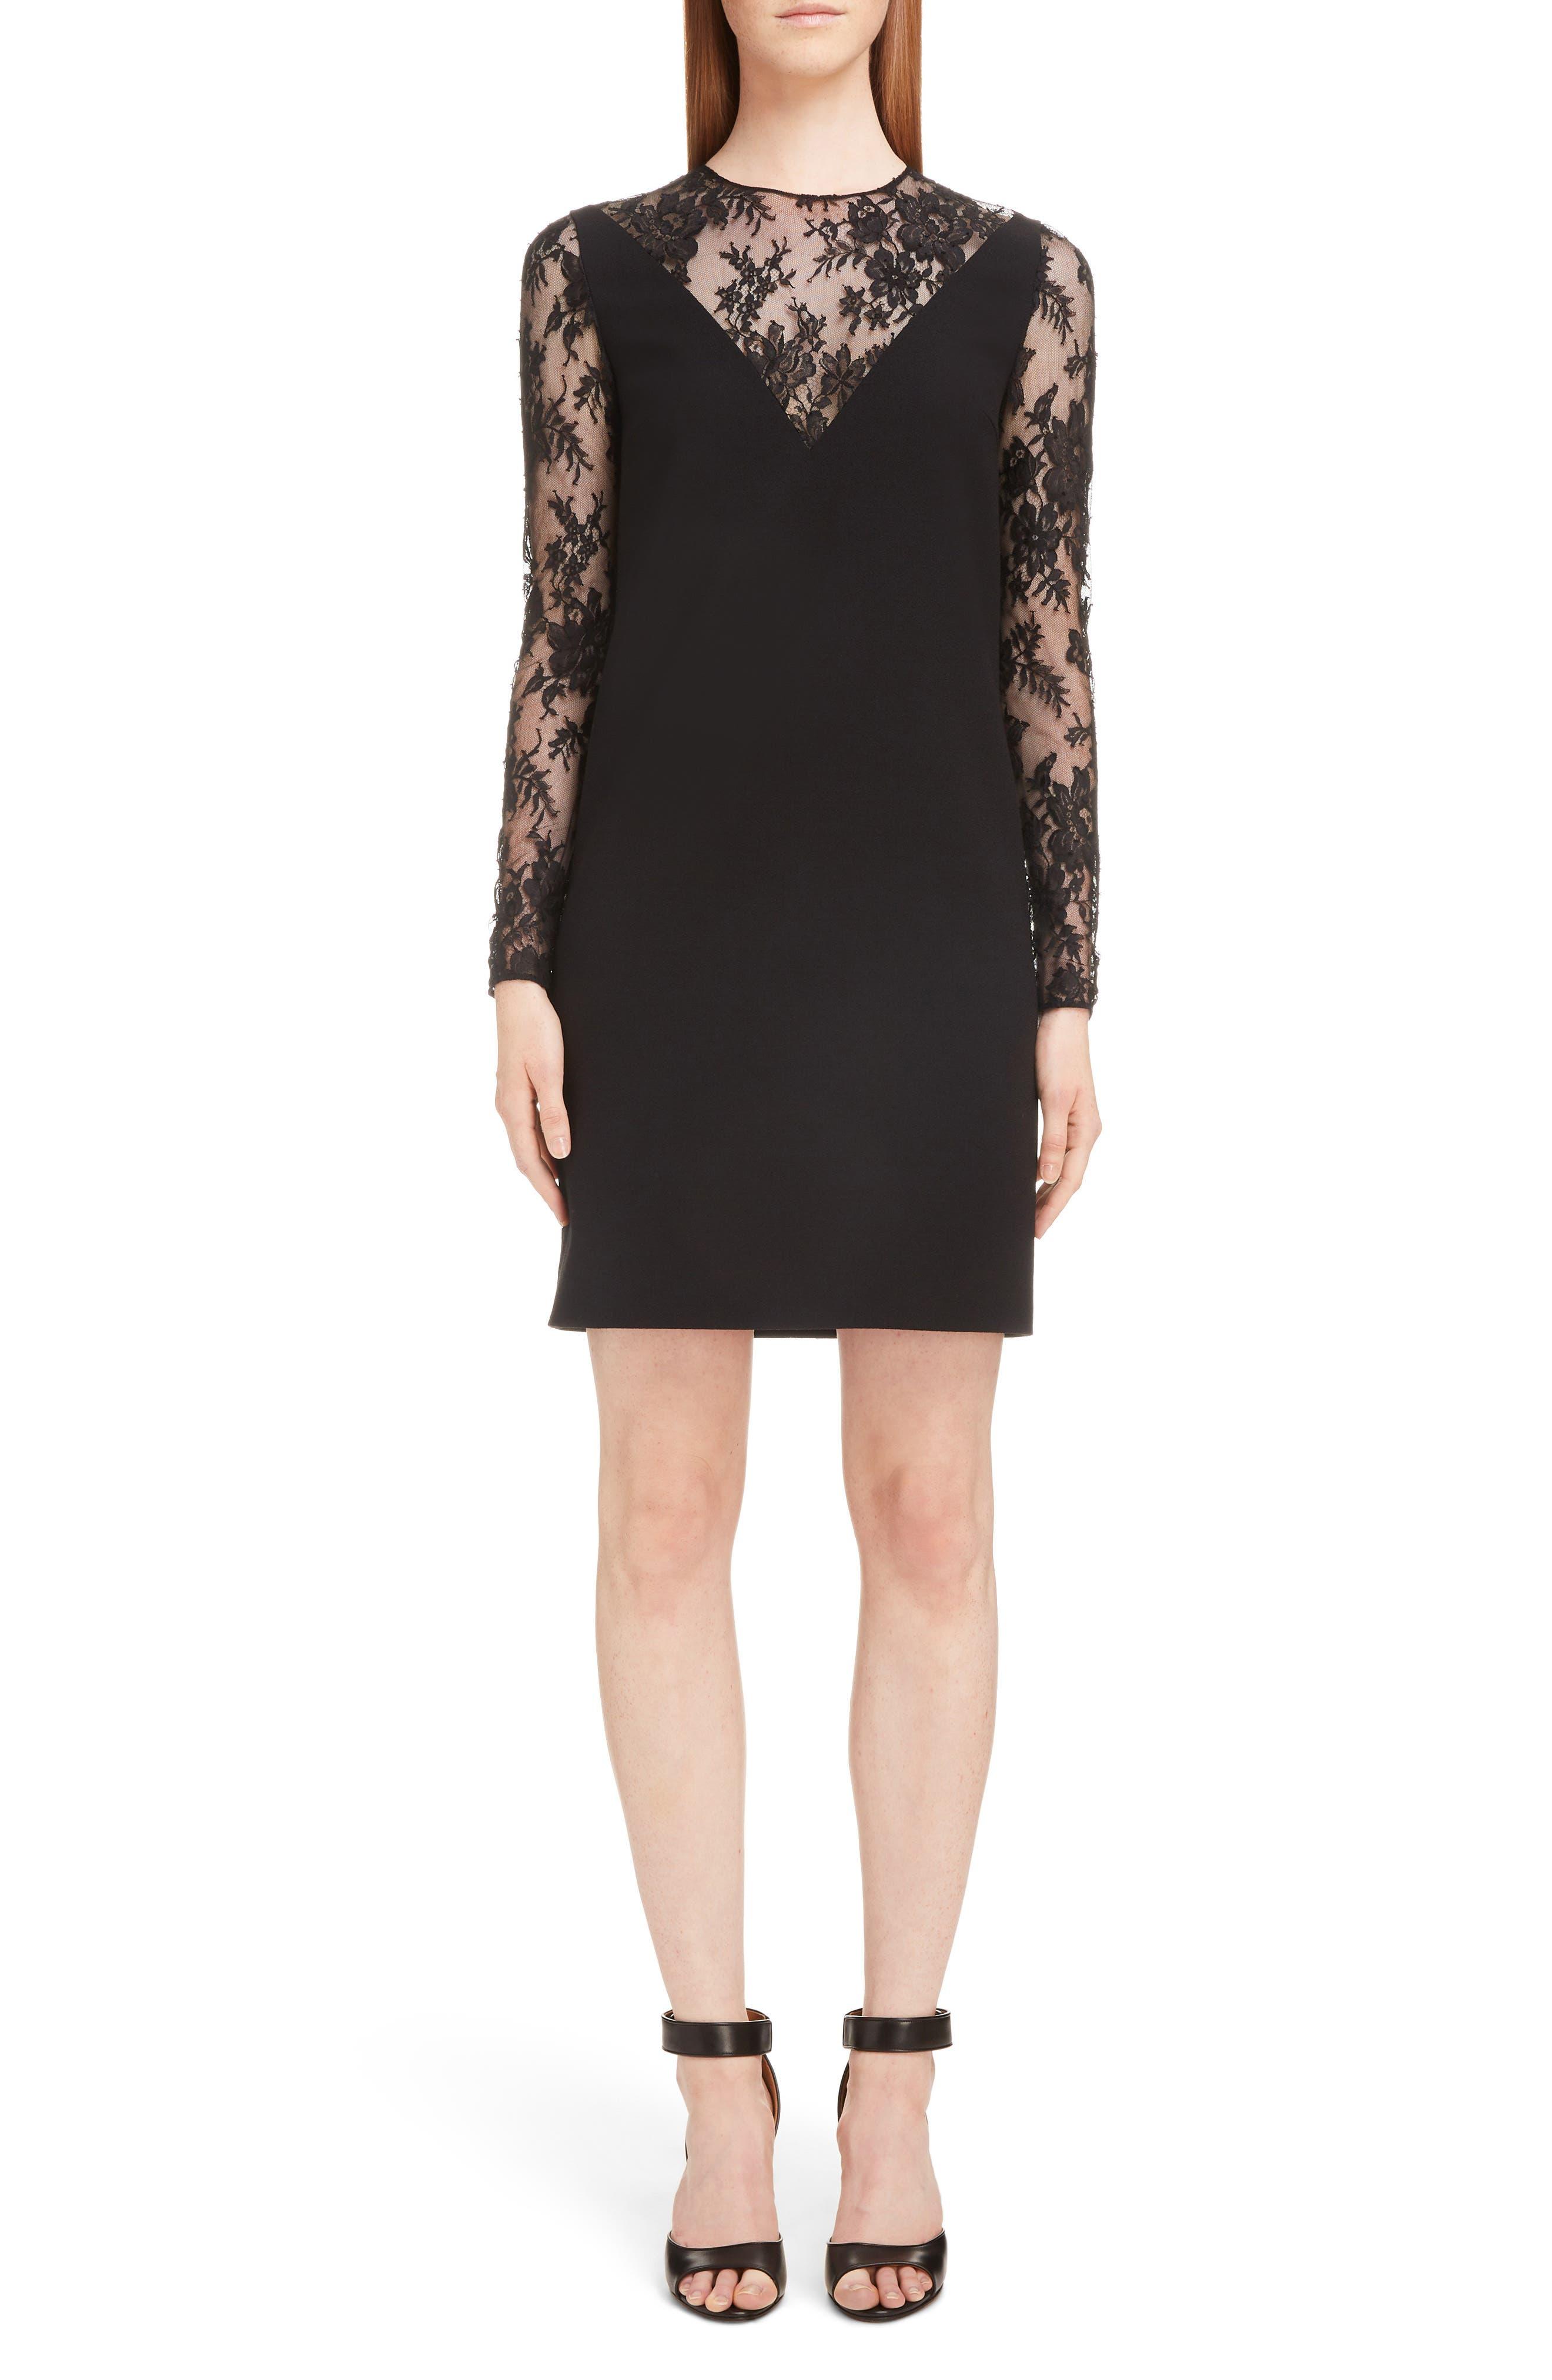 Givenchy Lace Illusion Dress, US / 44 FR - Black